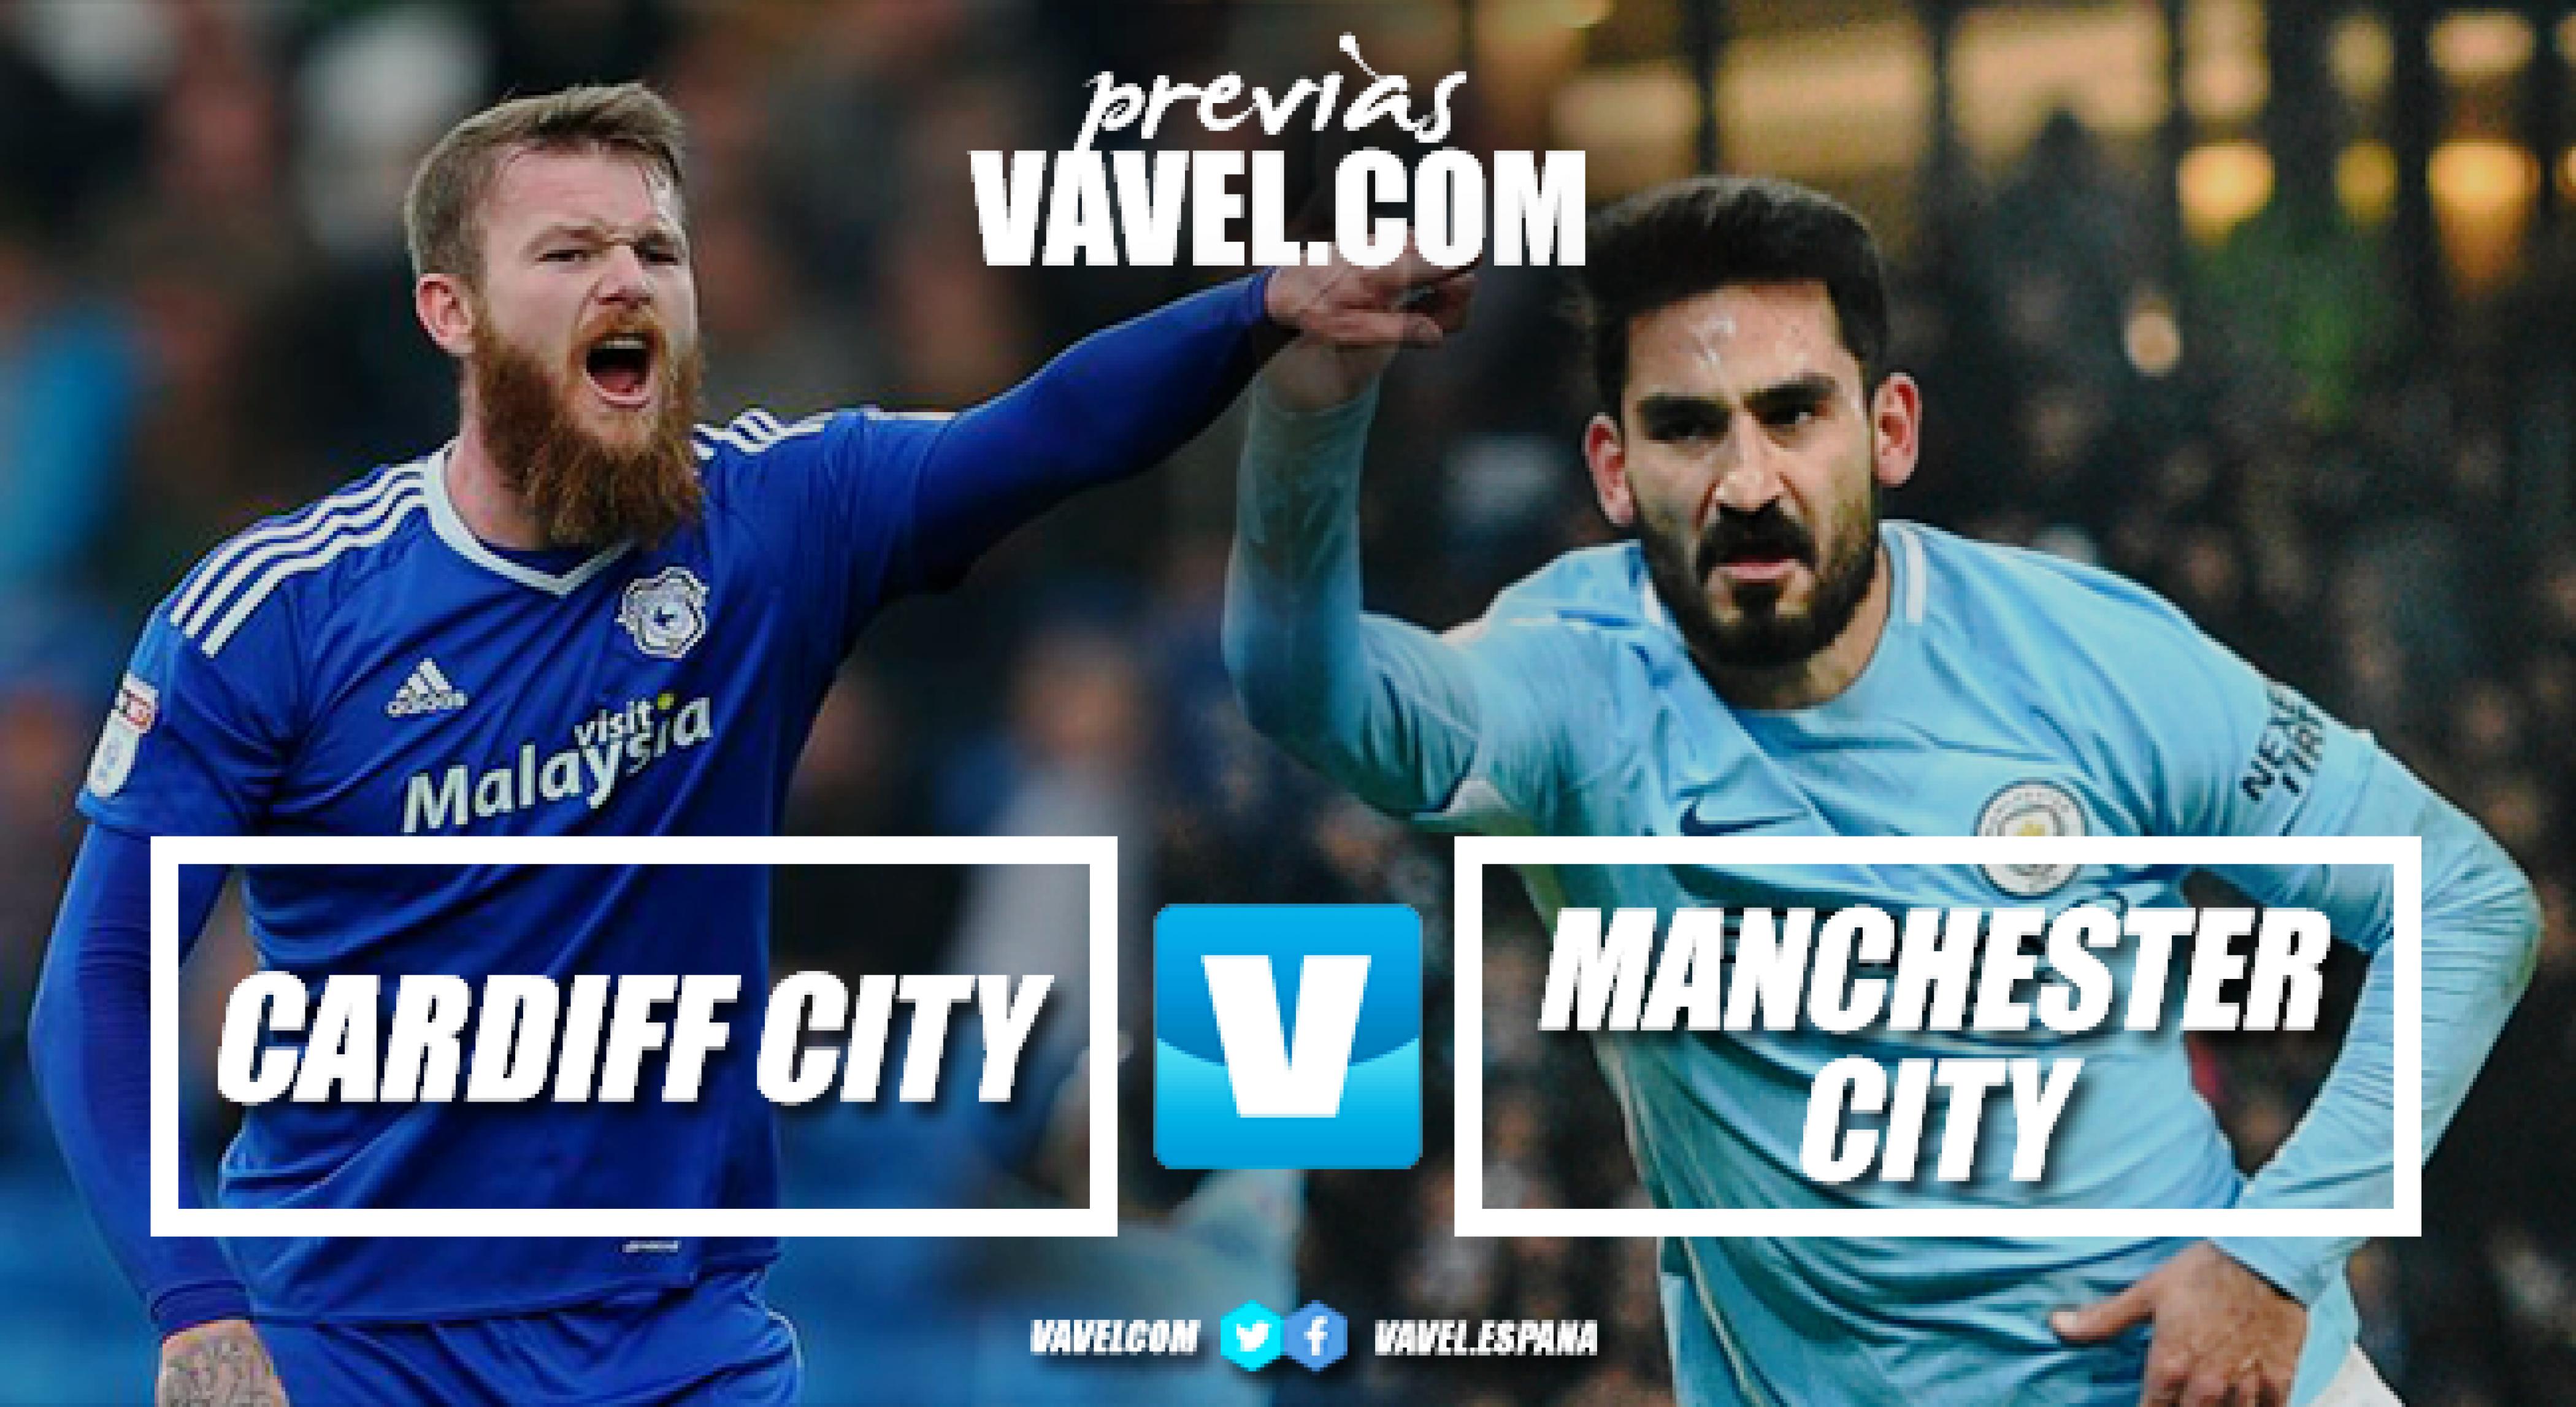 Previa Cardiff vs Manchester City: recuperar sensaciones